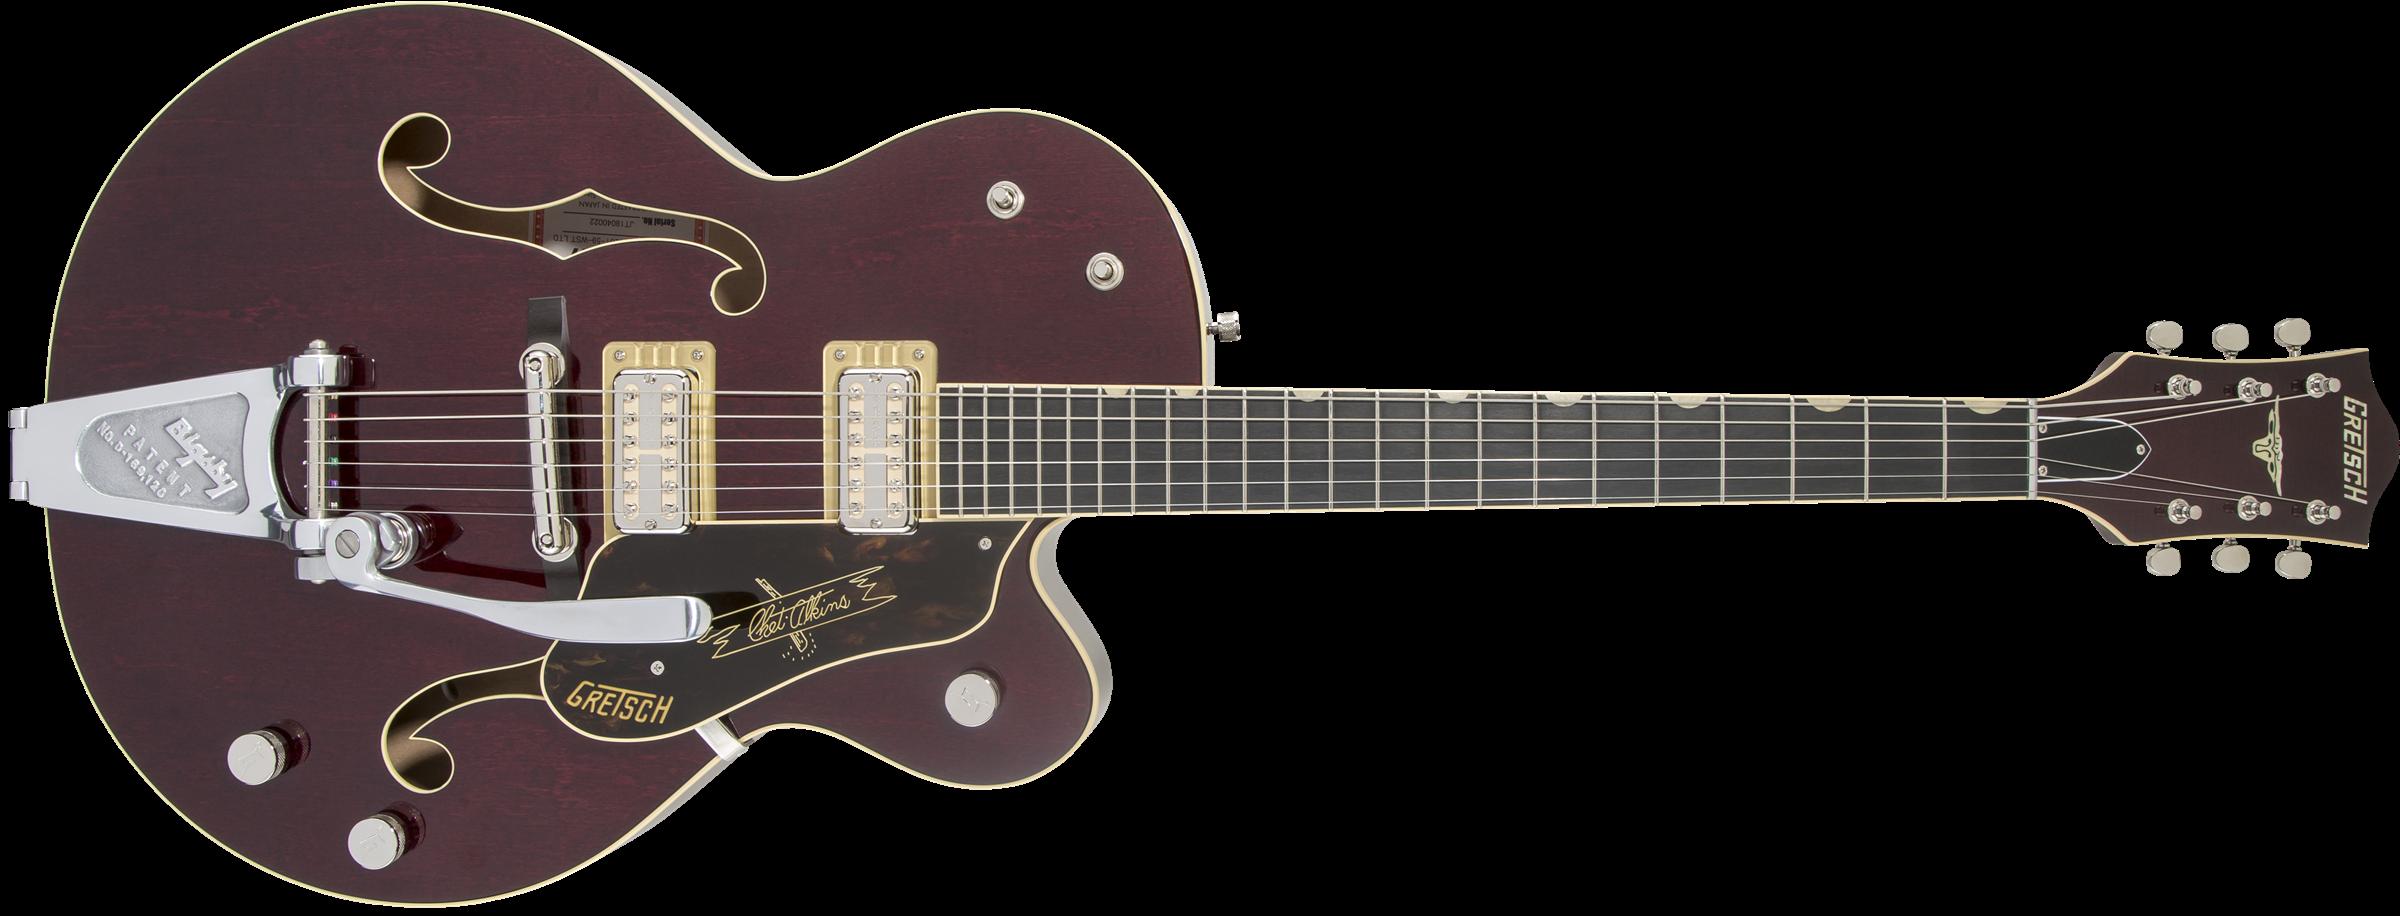 GRETSCH-G6120T-Limited-Edition-59-Nashville-Single-Cut-with-Bigsby-Ebony-Fingerboard-Dark-Cherry-Stain-sku-571002970